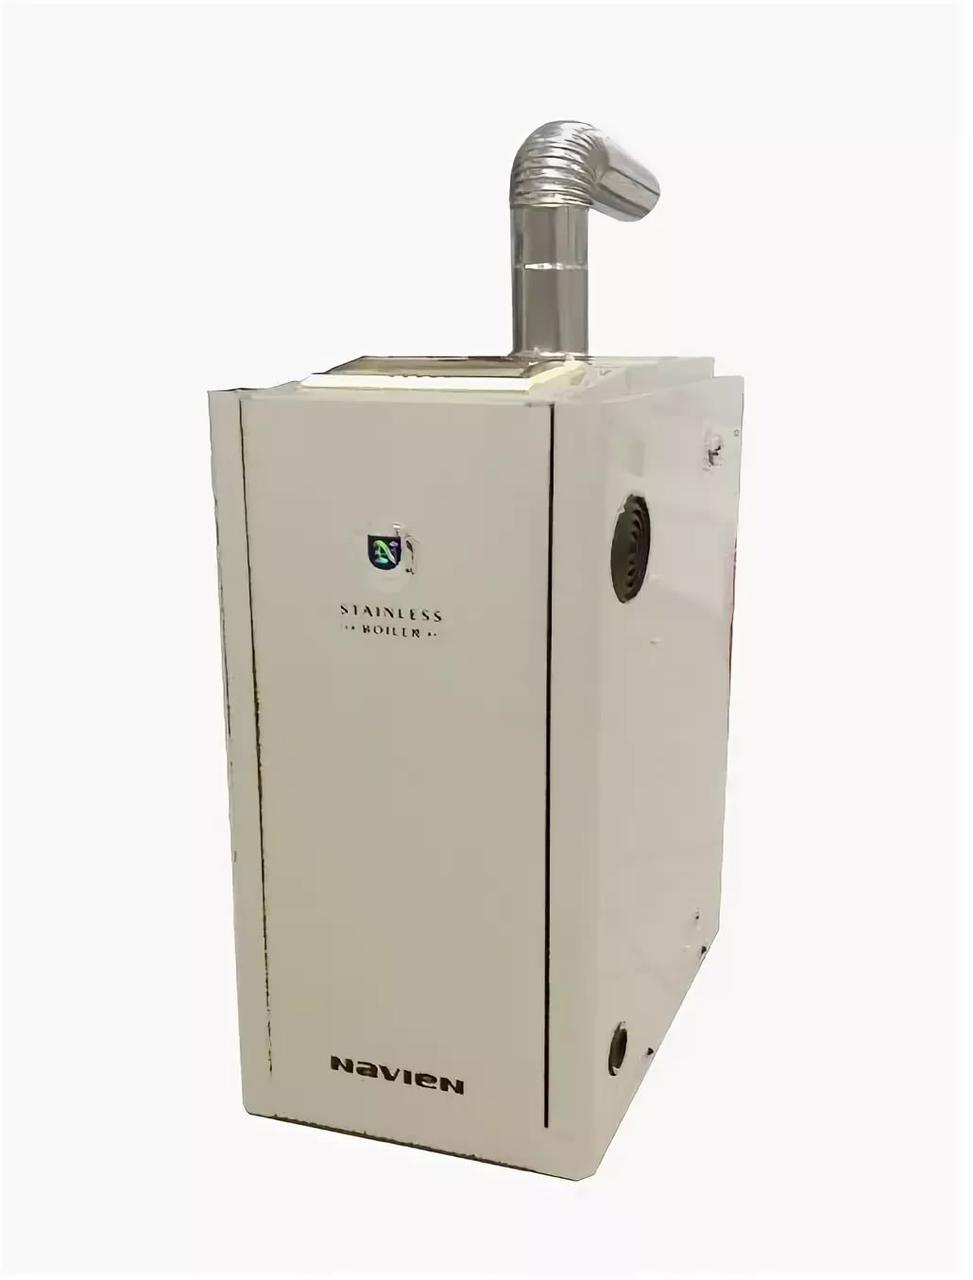 Navien GST 60KN напольный газовый двухконтурный котел